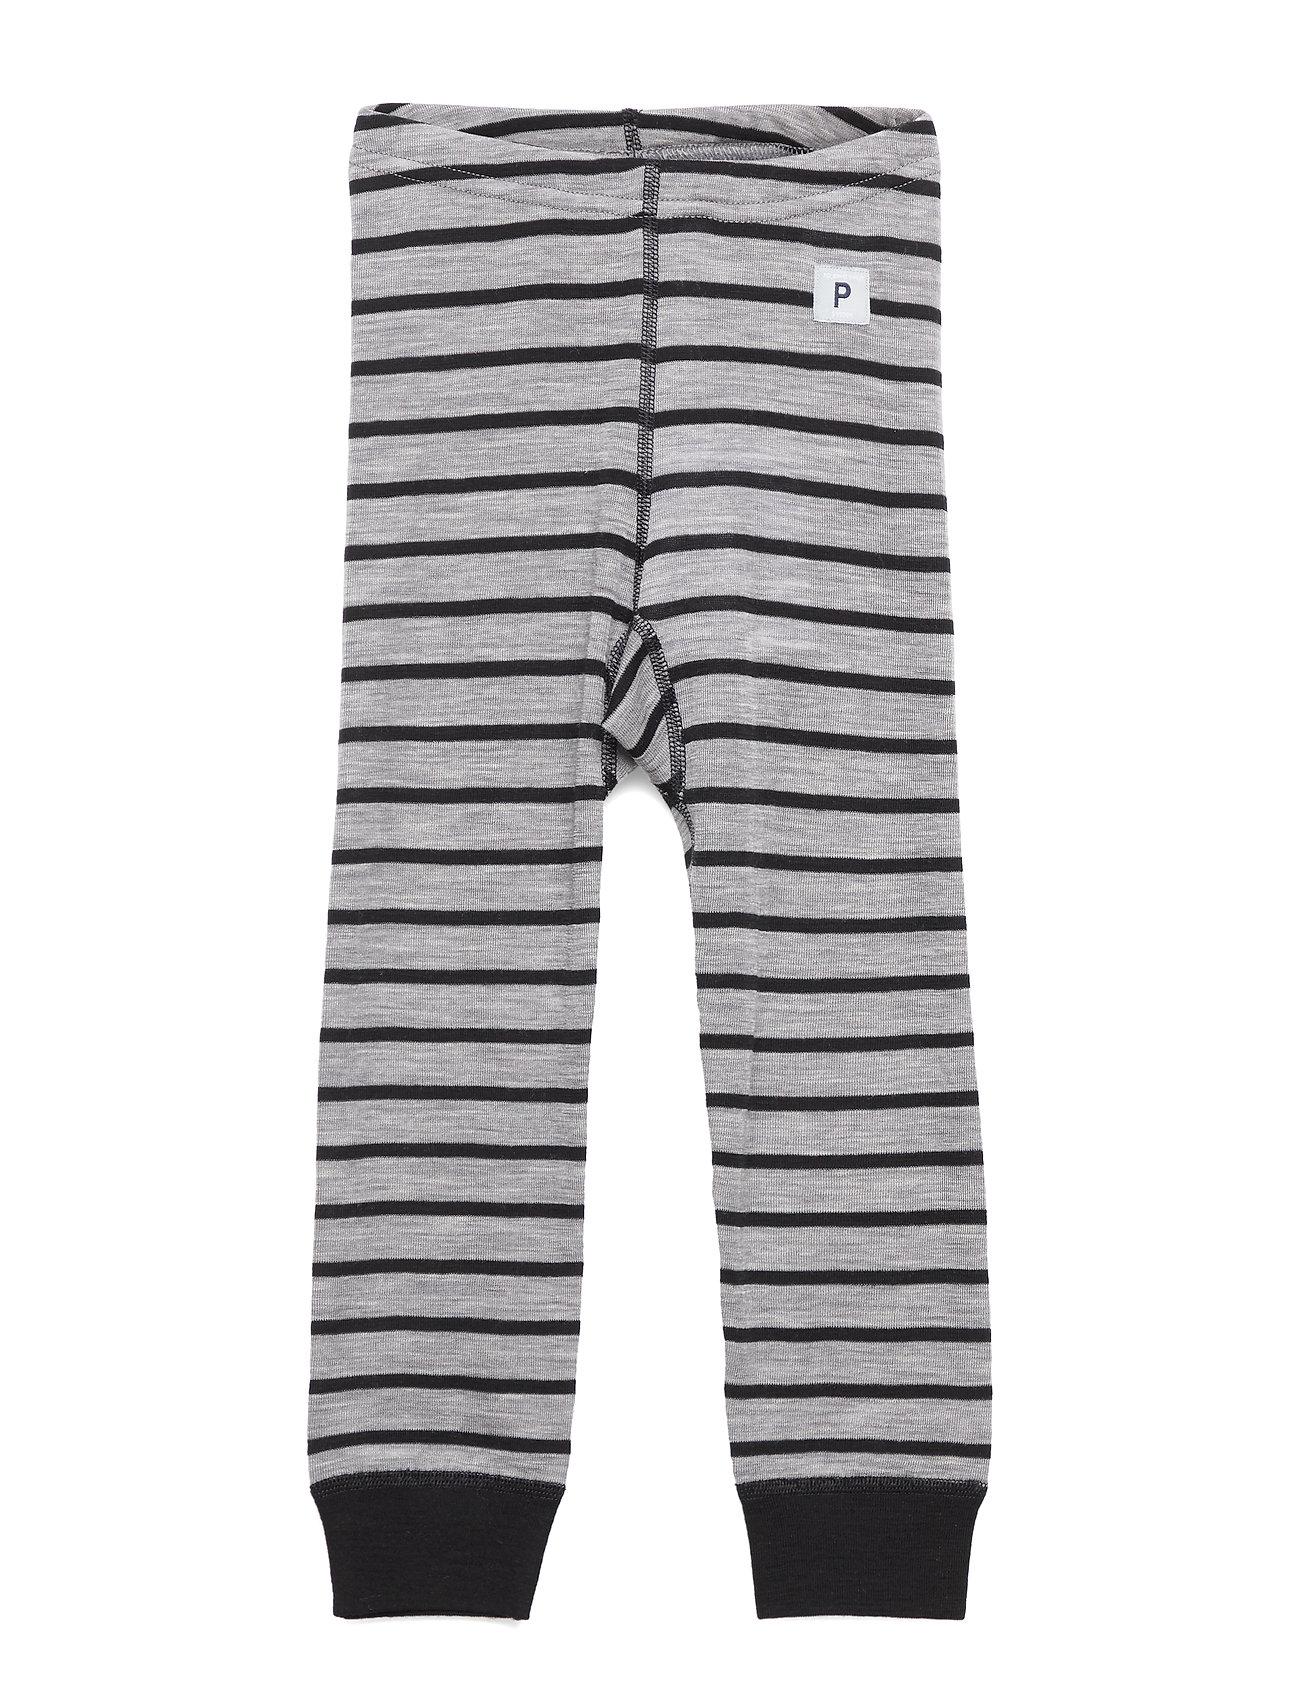 Polarn O. Pyret Long Johns Wool Striped Pre-shool - GREYMELANGE